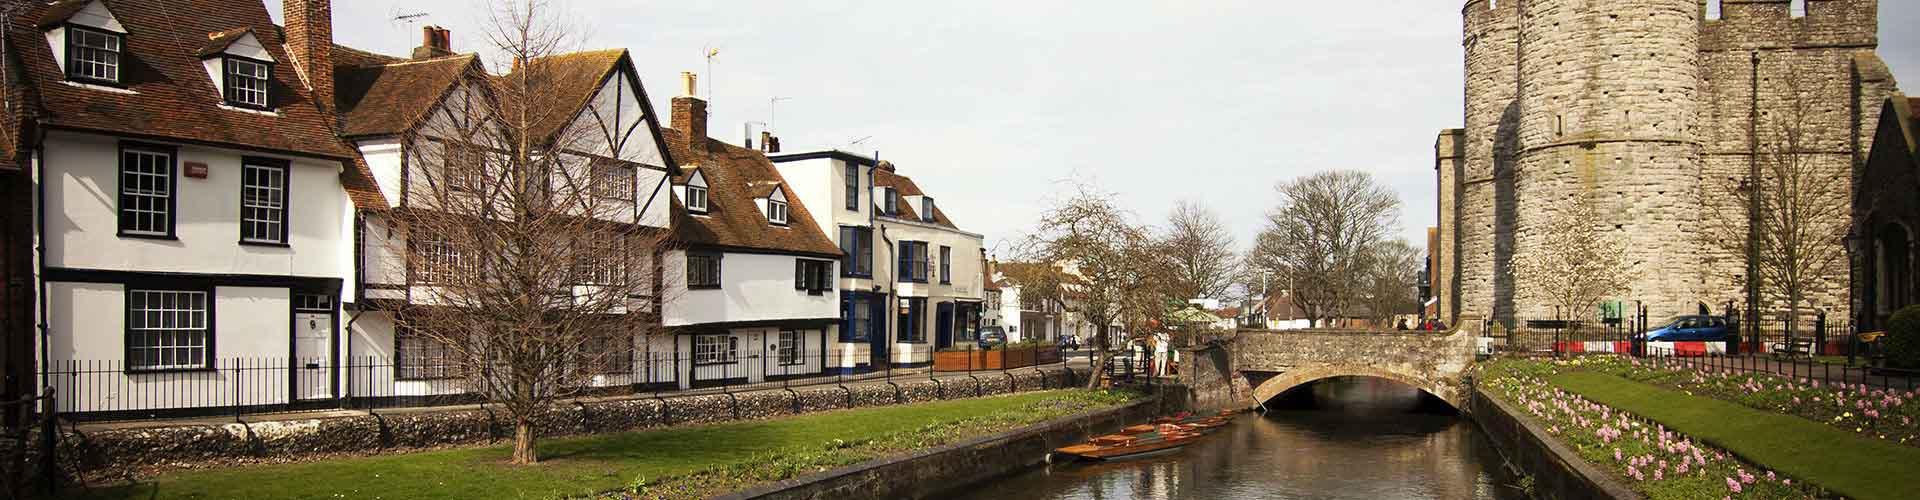 Canterbury - apartmány v Canterbury. Mapy pro Canterbury, fotky a recenze pro každý apartmán - Canterbury.